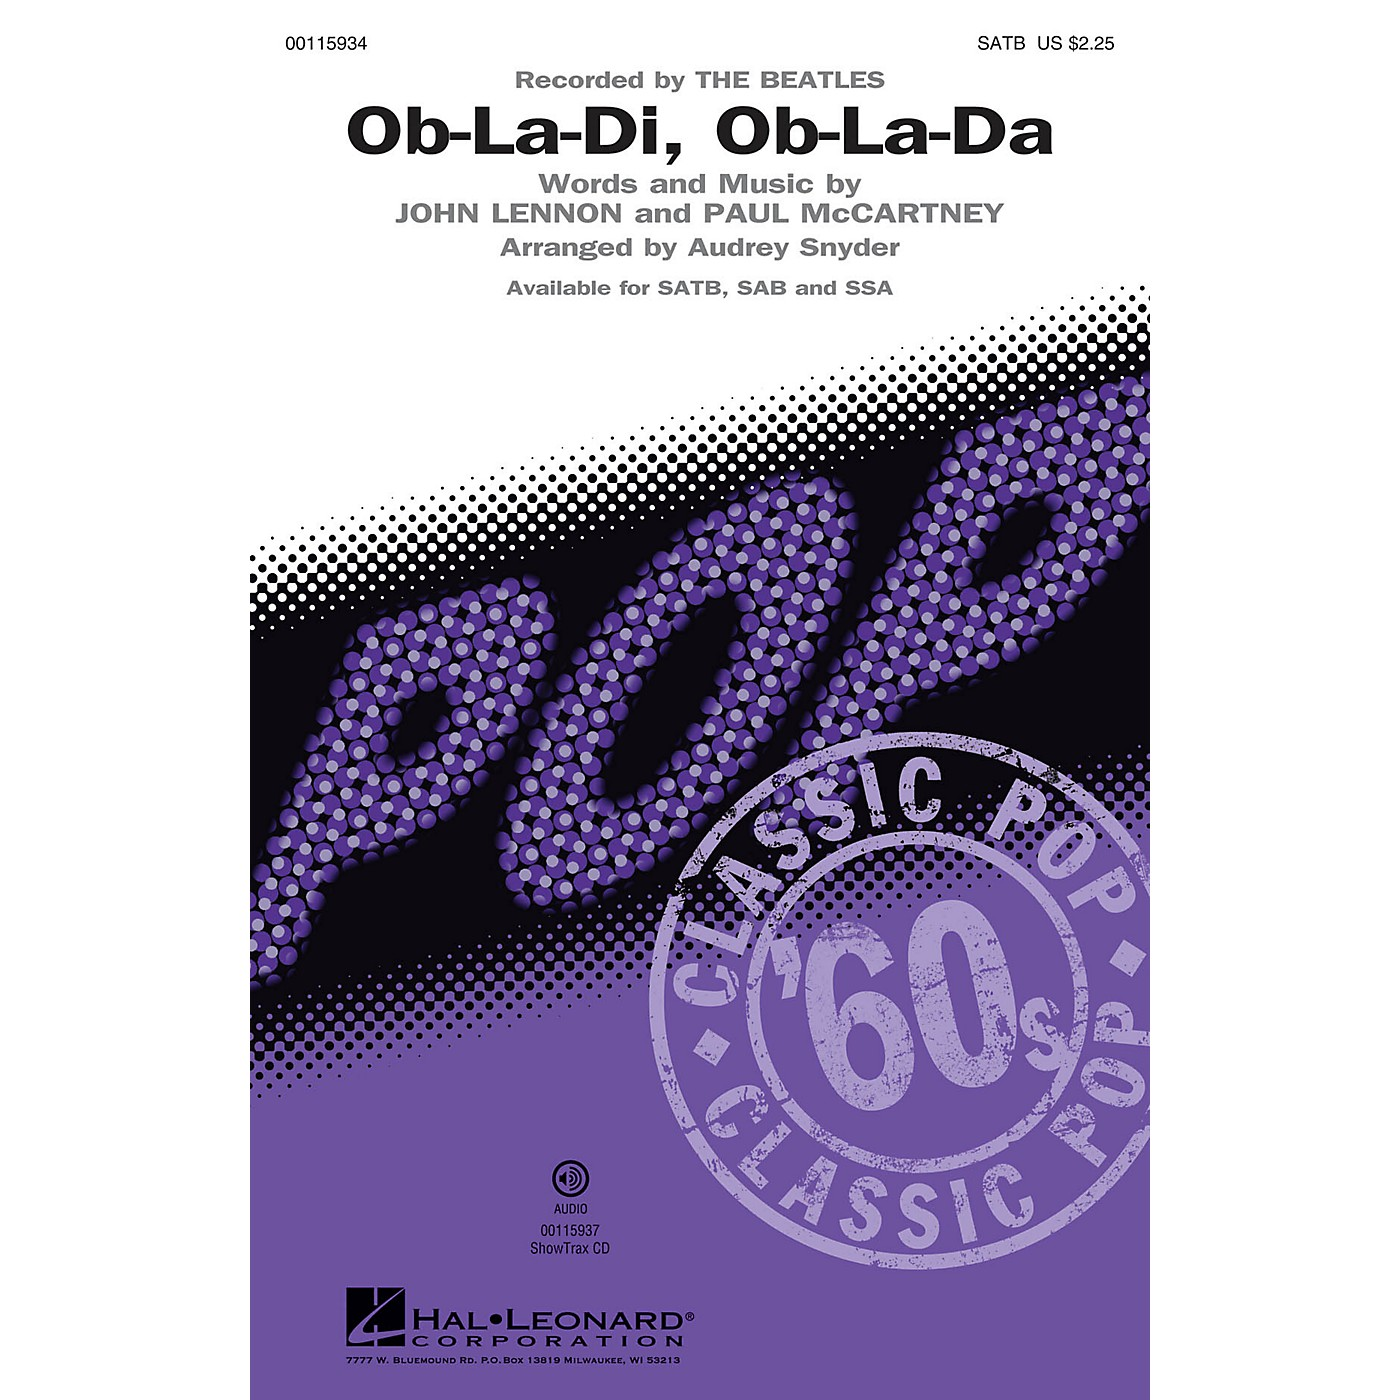 Hal Leonard Ob-La-Di, Ob-La-Da (Recorded by THE BEATLES SAB) SAB by The Beatles Arranged by Audrey Snyder thumbnail